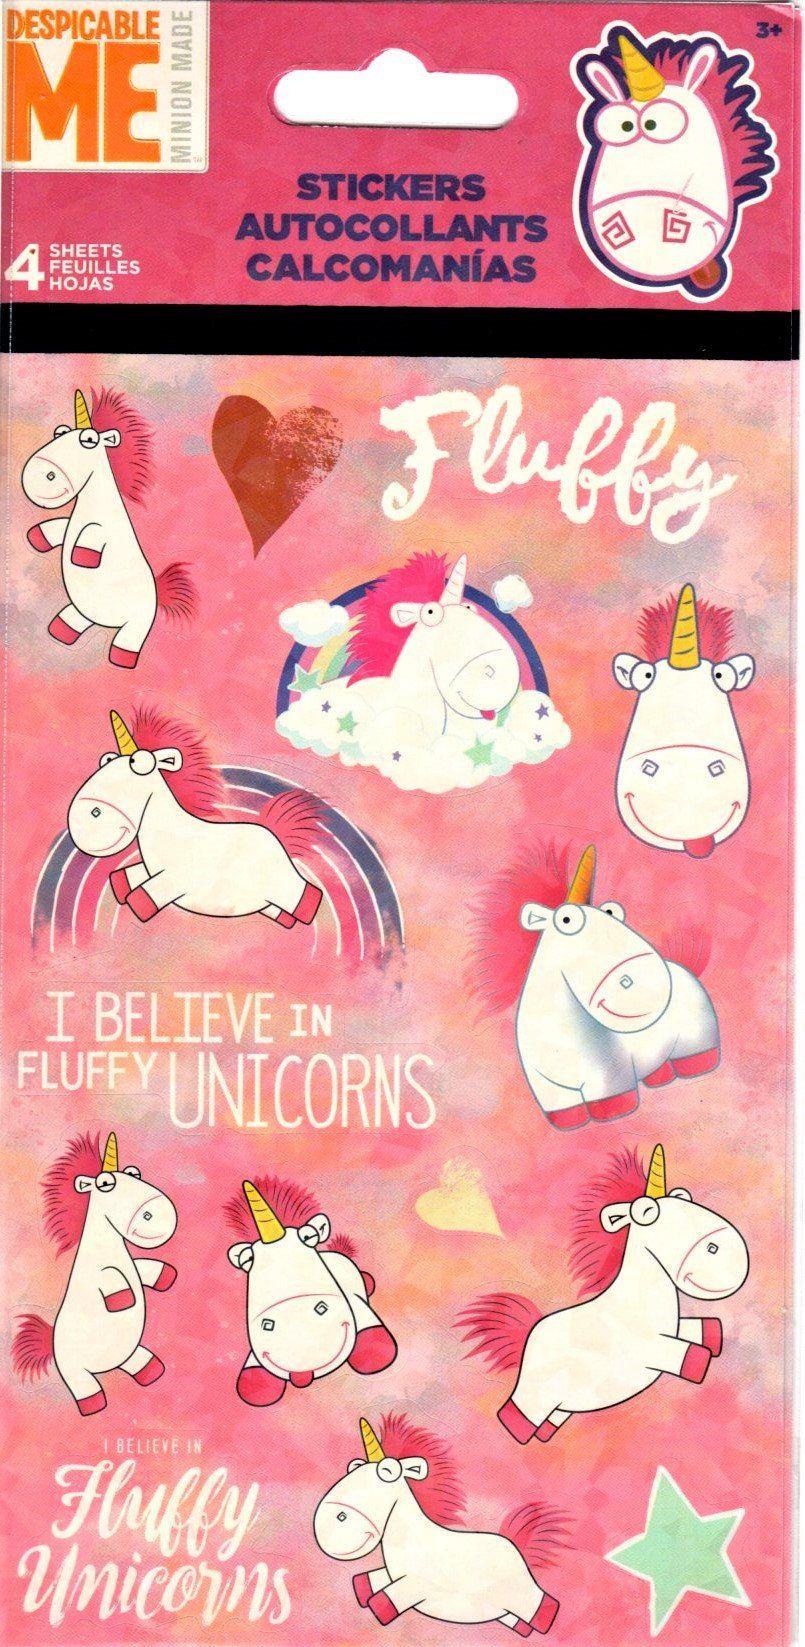 Unicorn Sticker Sheet I Believe in Unicorns Unicorn Themed Party 35 stickers